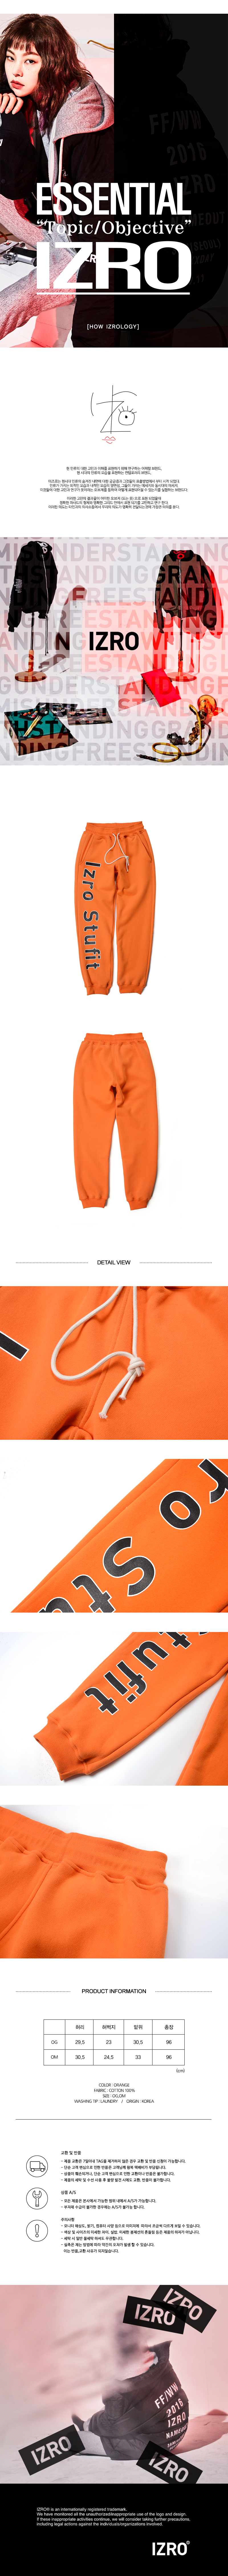 DETAIL IZRO-STUFIT-PANTS-orange.jpg